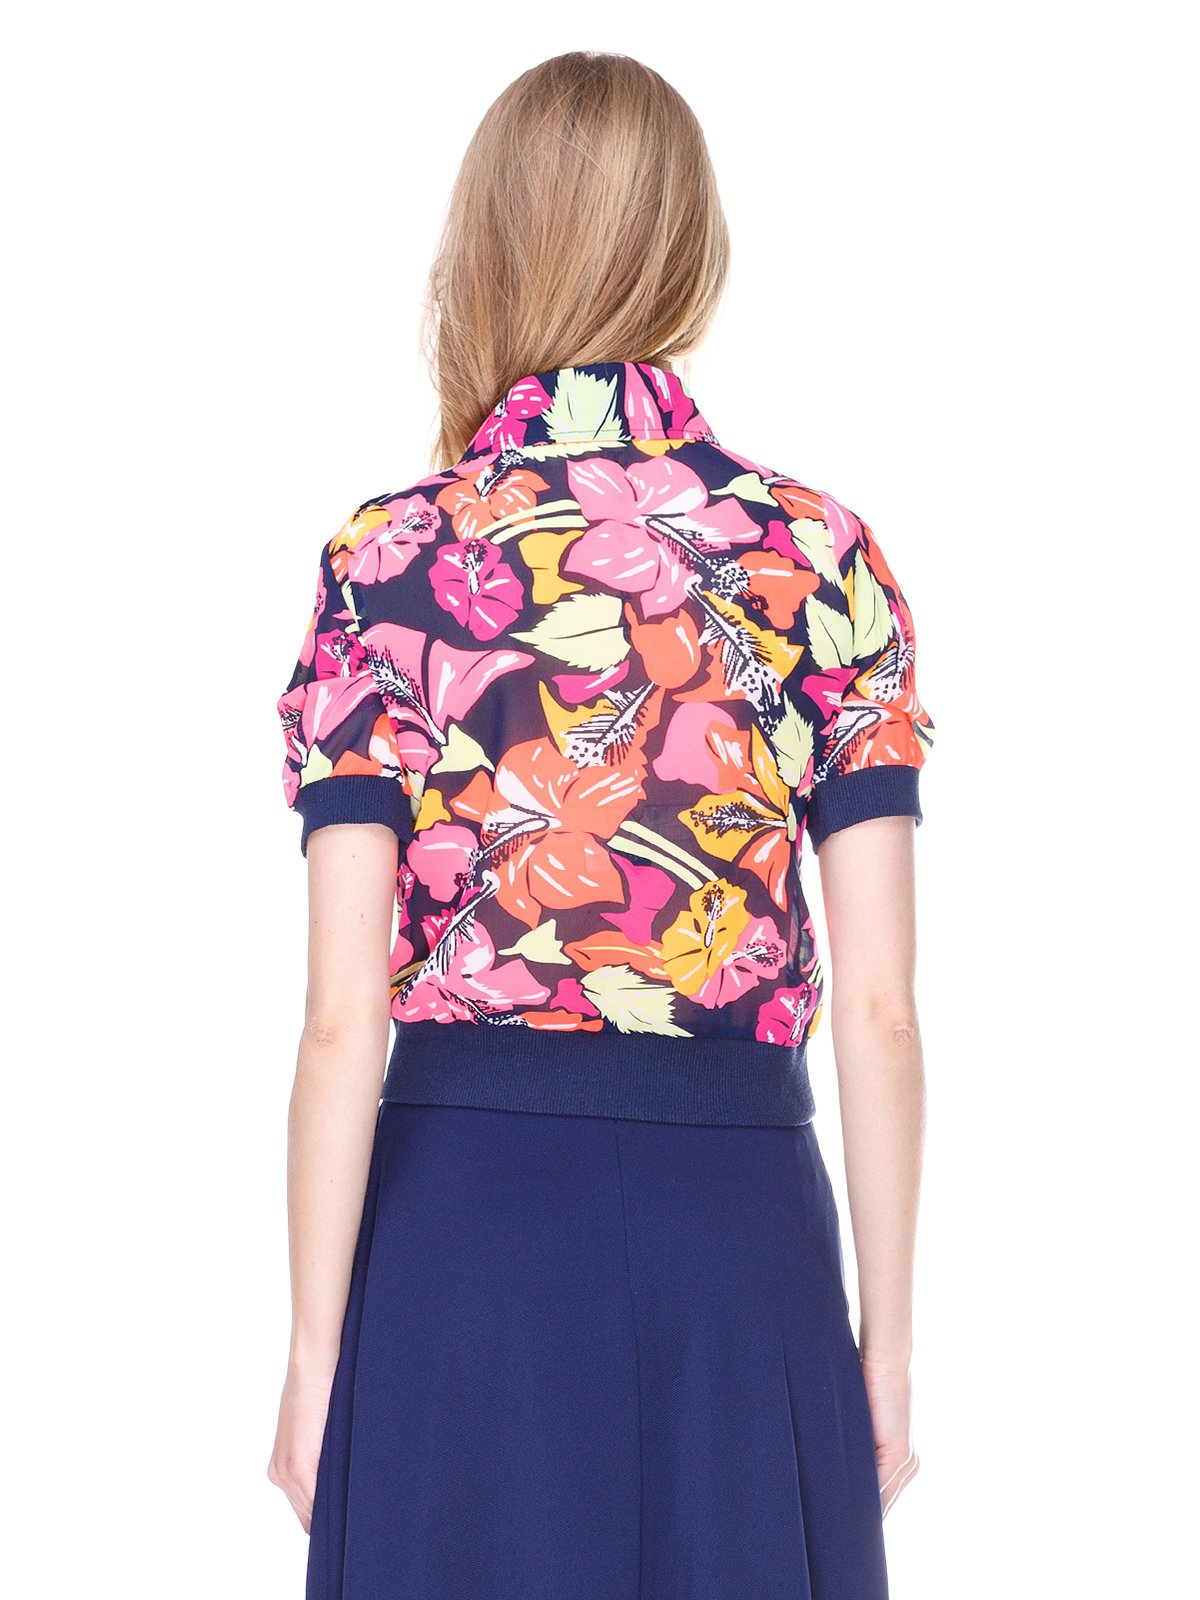 Блуза темно-синяя с цветочным принтом | 2273972 | фото 2